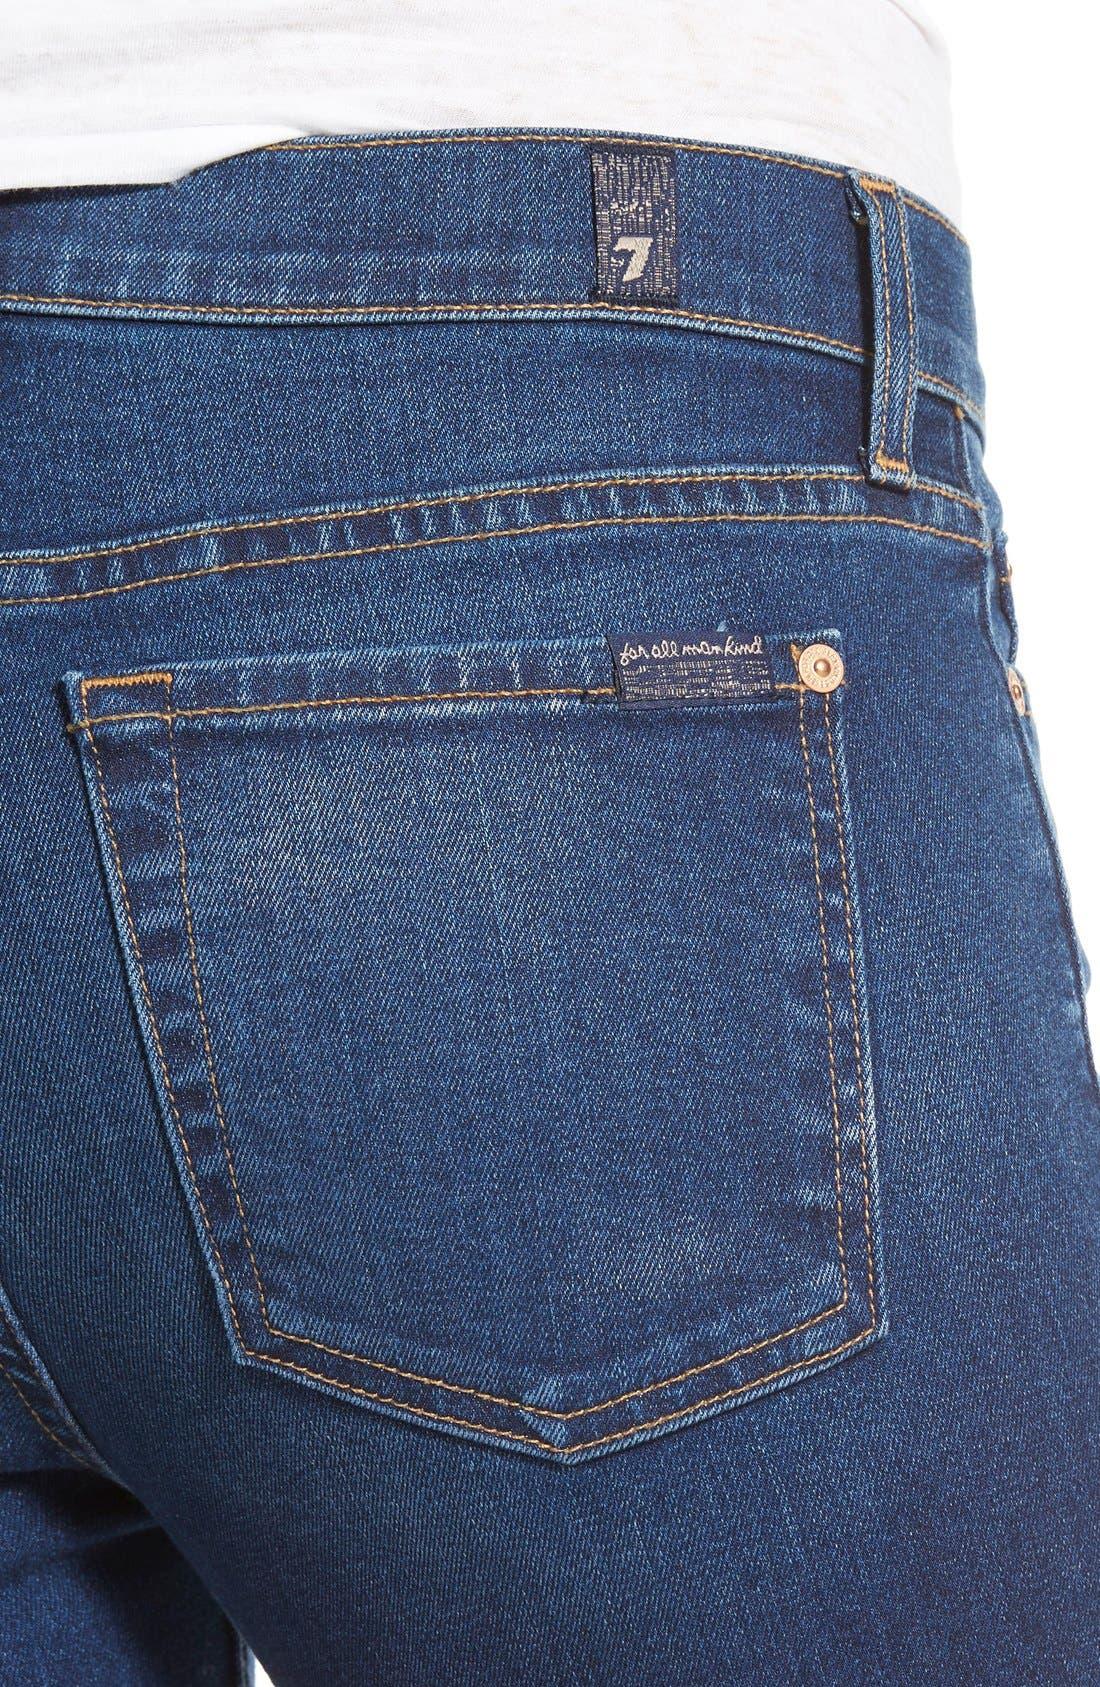 Alternate Image 4  - 7 For All Mankind® Destroyed Ankle Skinny Jeans (Stunning Seville 2)